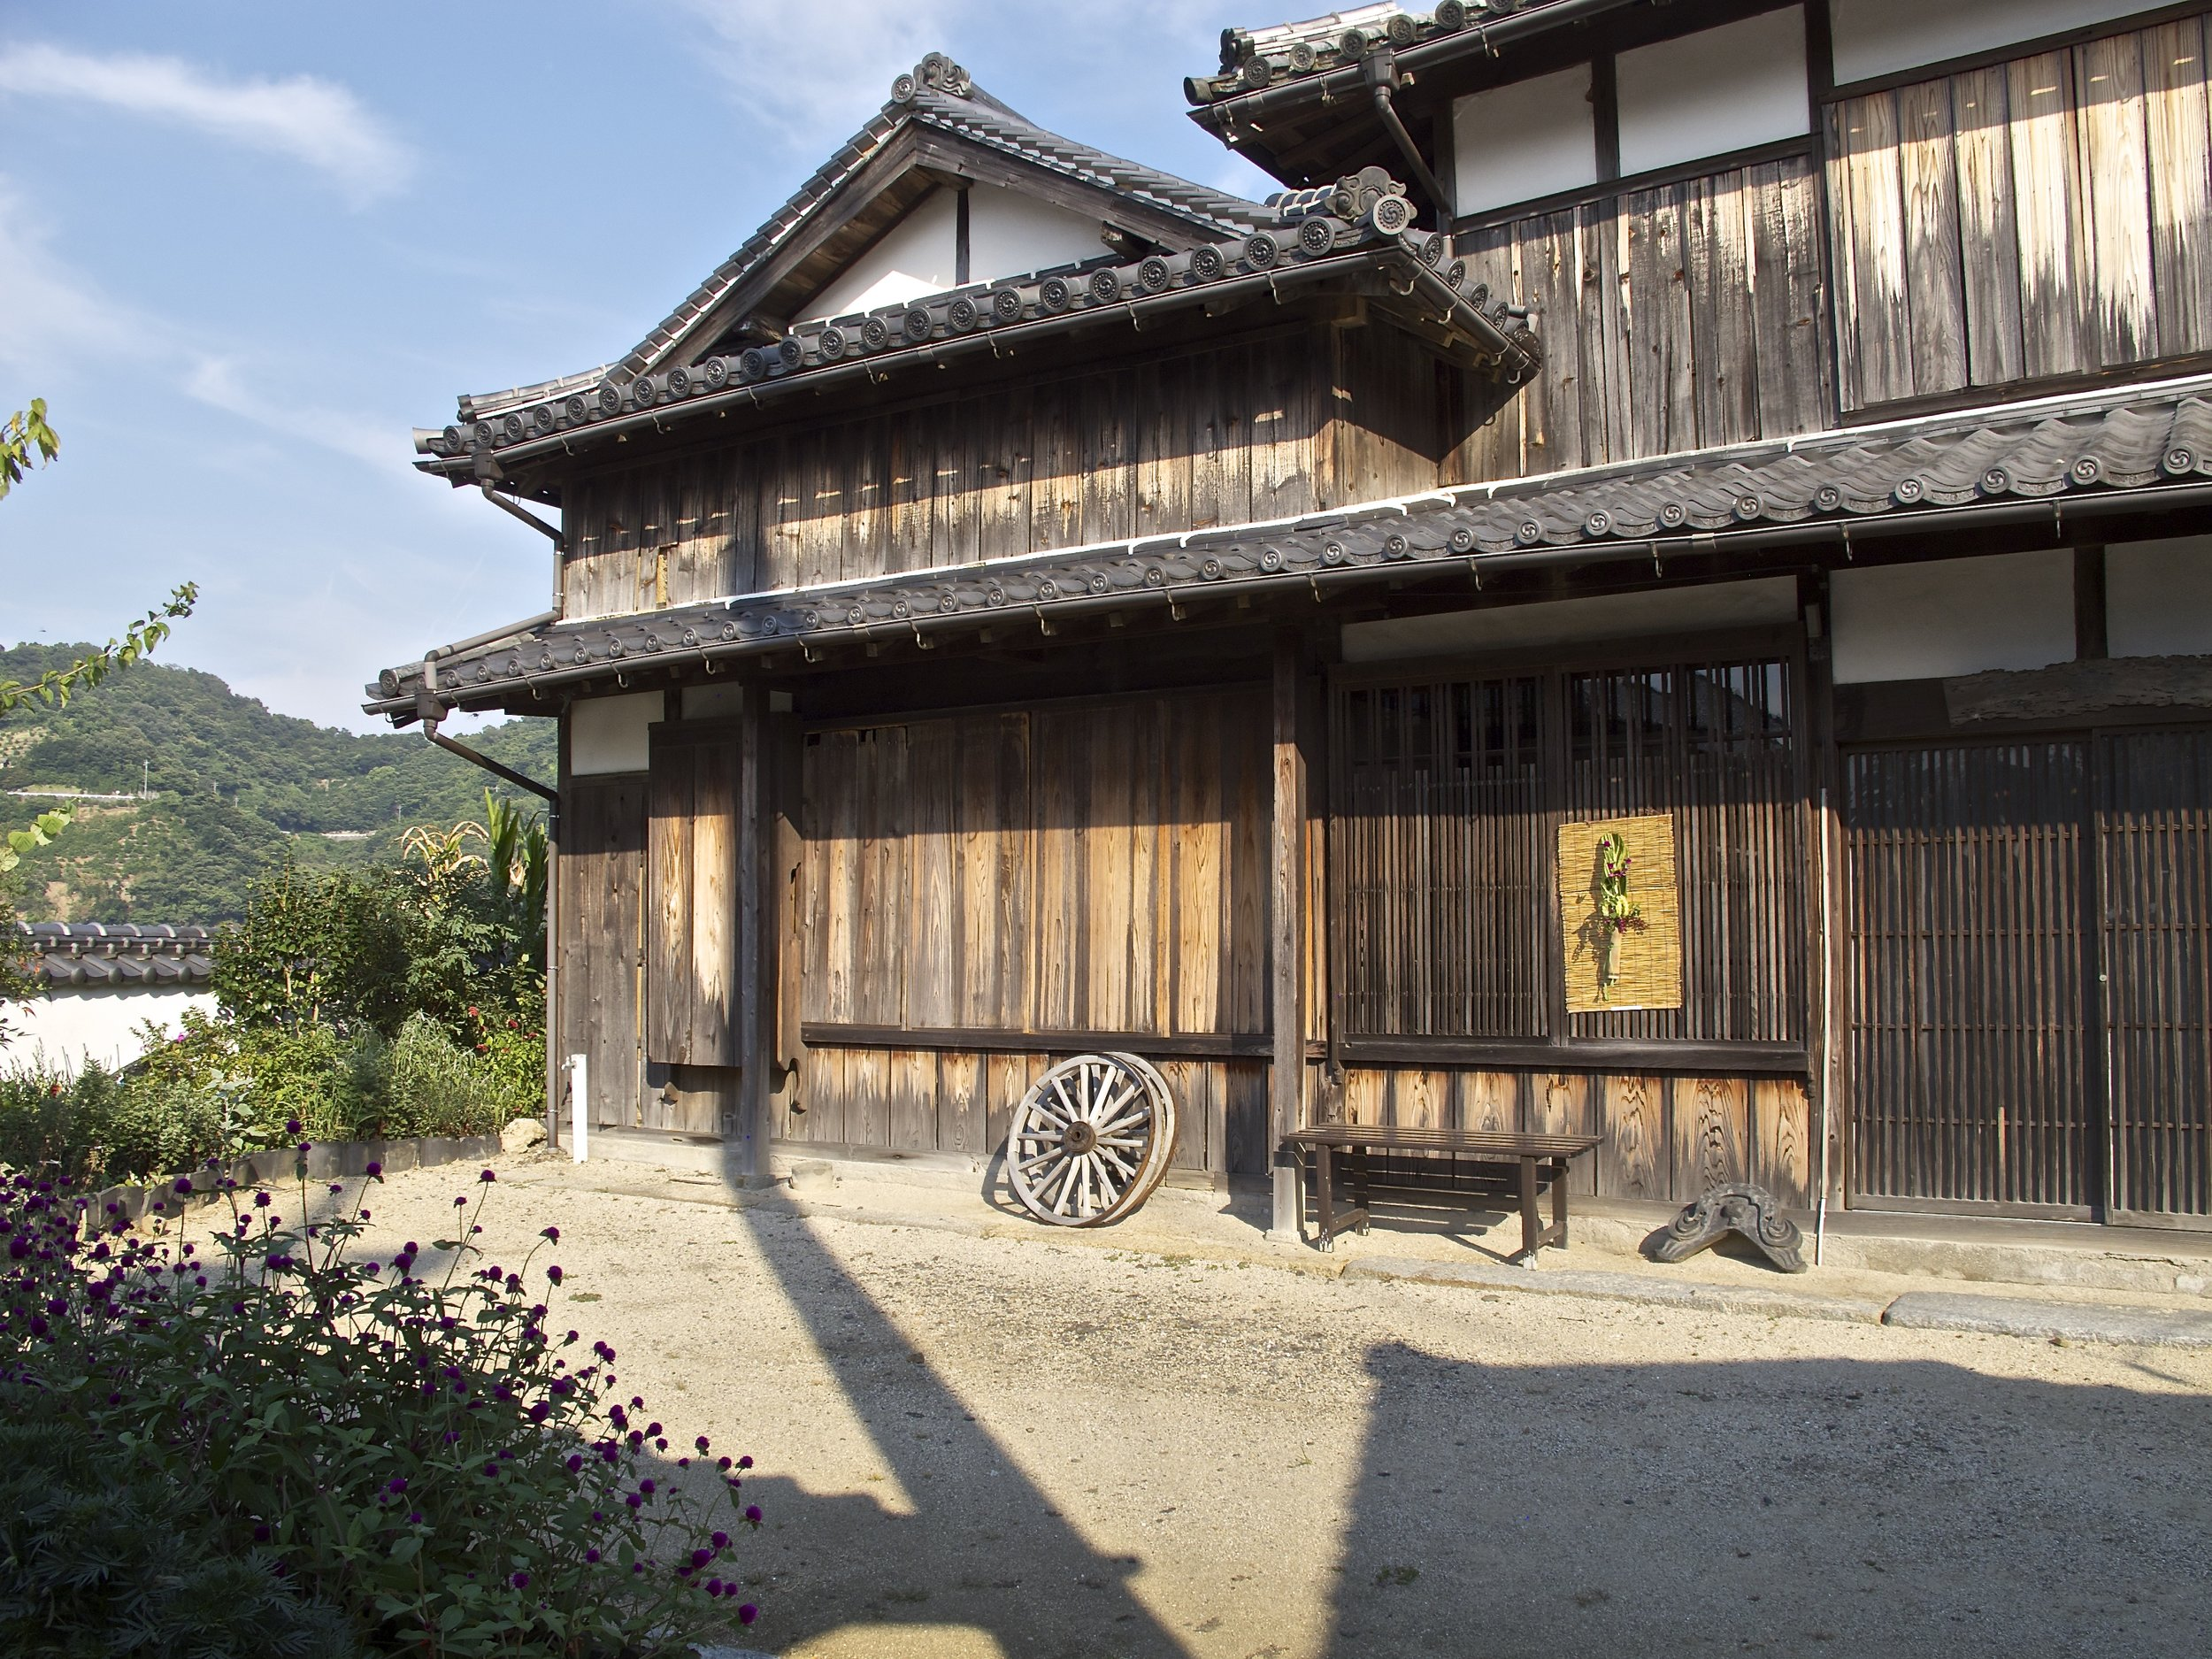 One of the Edo-era merchant trading houses in Mitarai where the overthrow of the Tokugawa Shogunate was plotted.